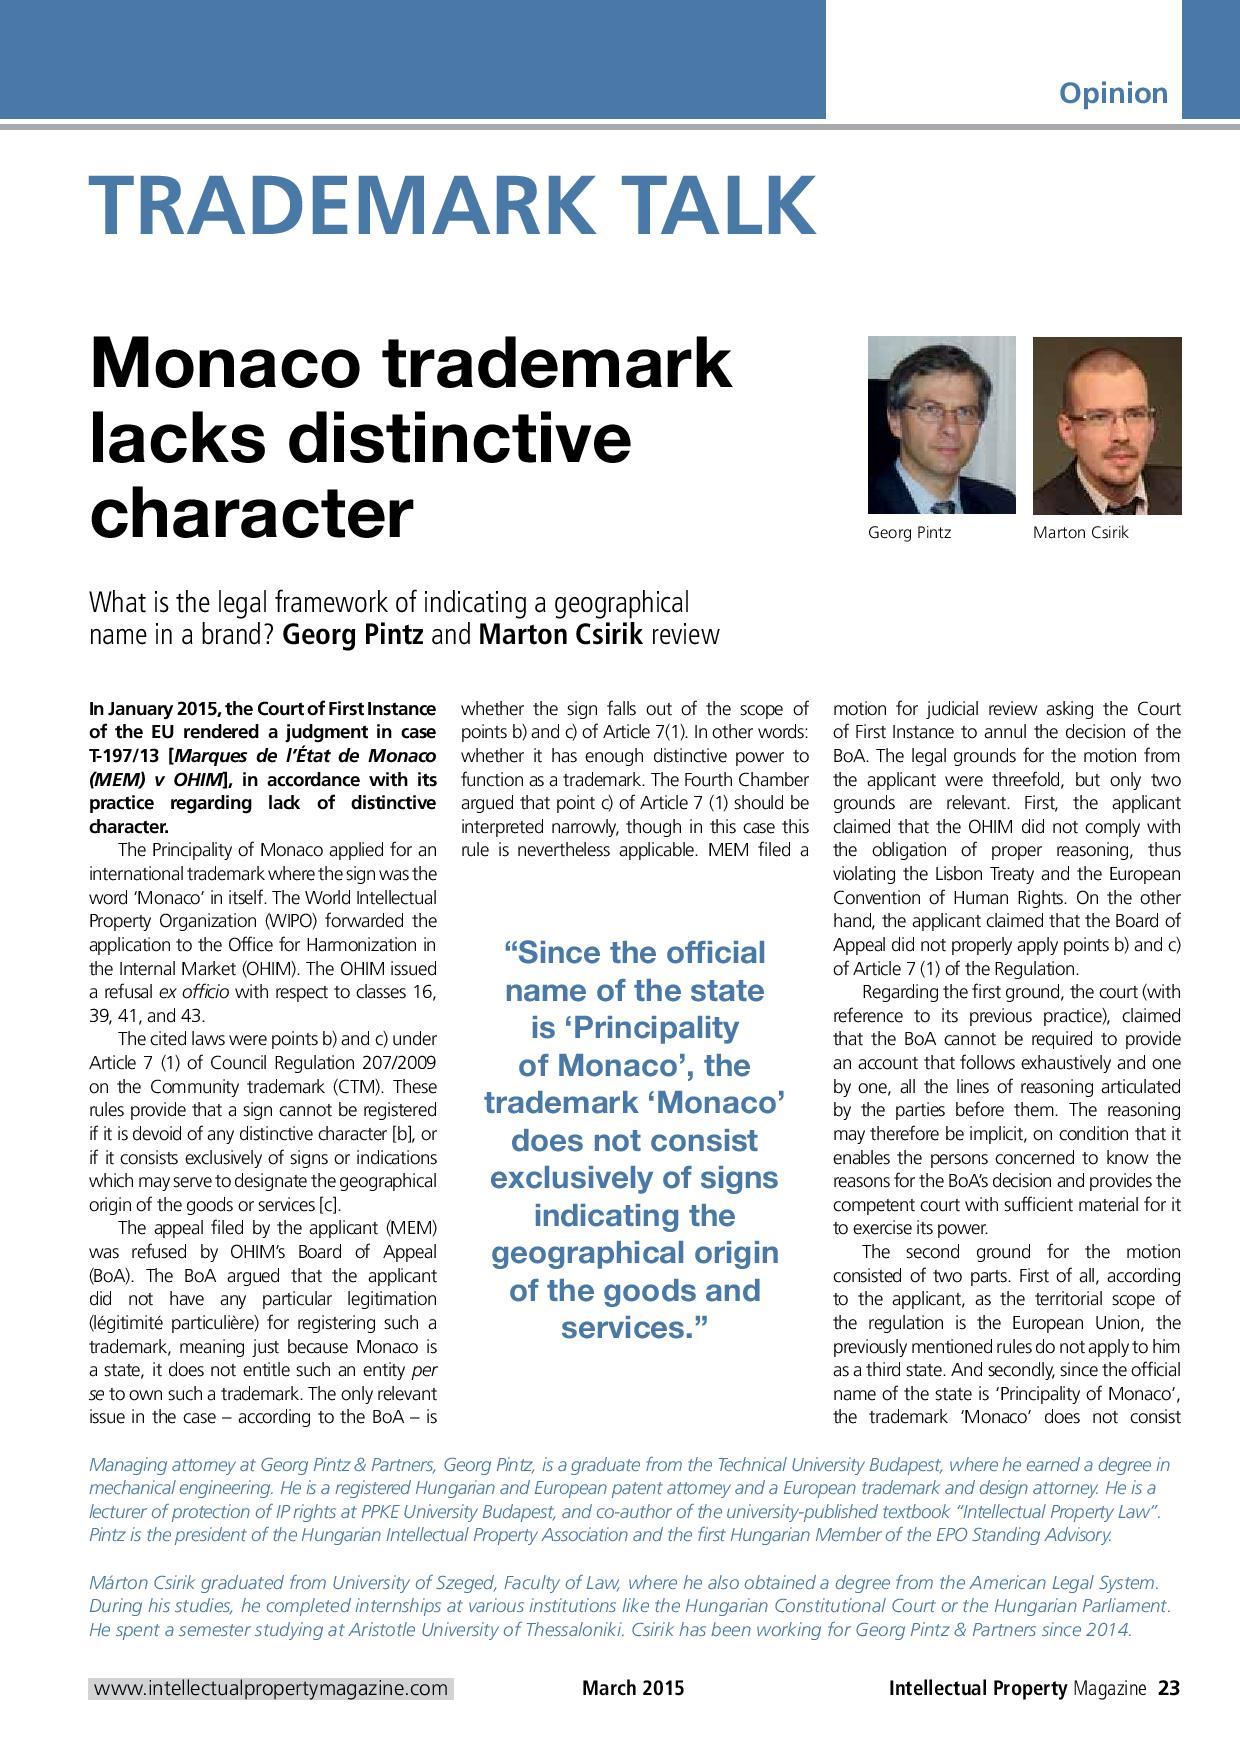 intellectual-property-trademark-pintz-csirik-page-001.jpg